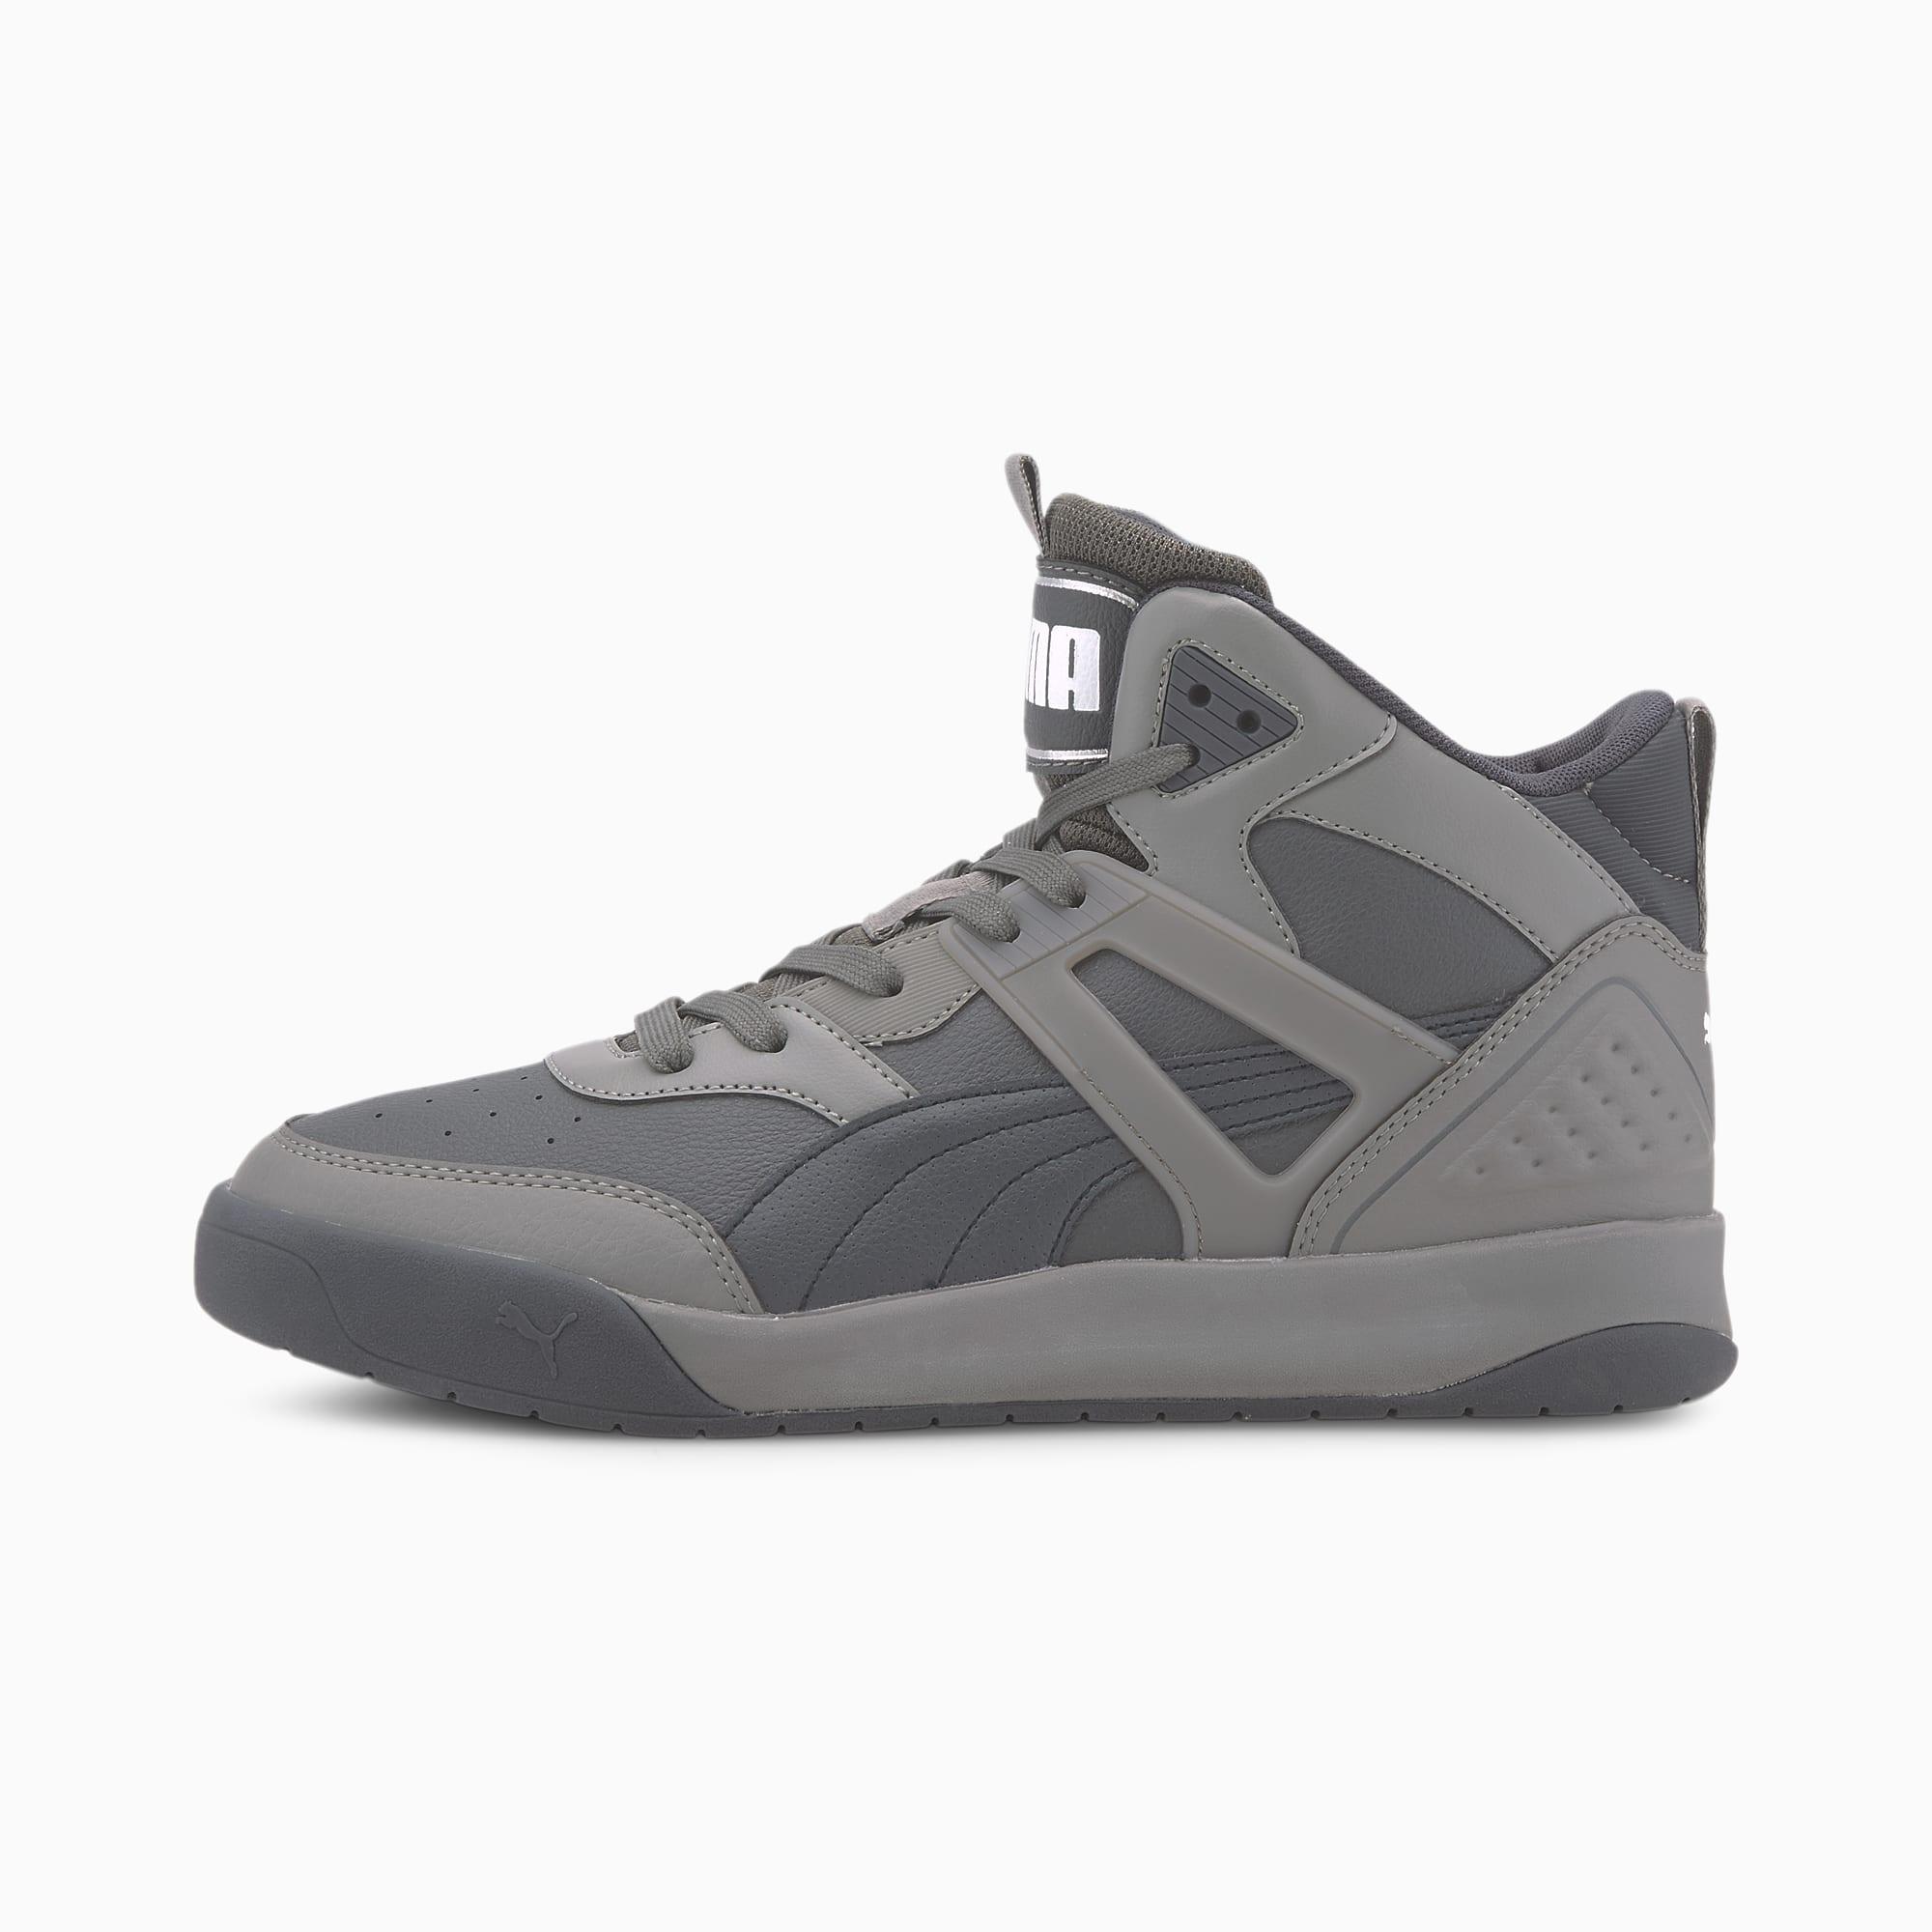 PUMA Backcourt Mid Men's Sneakers